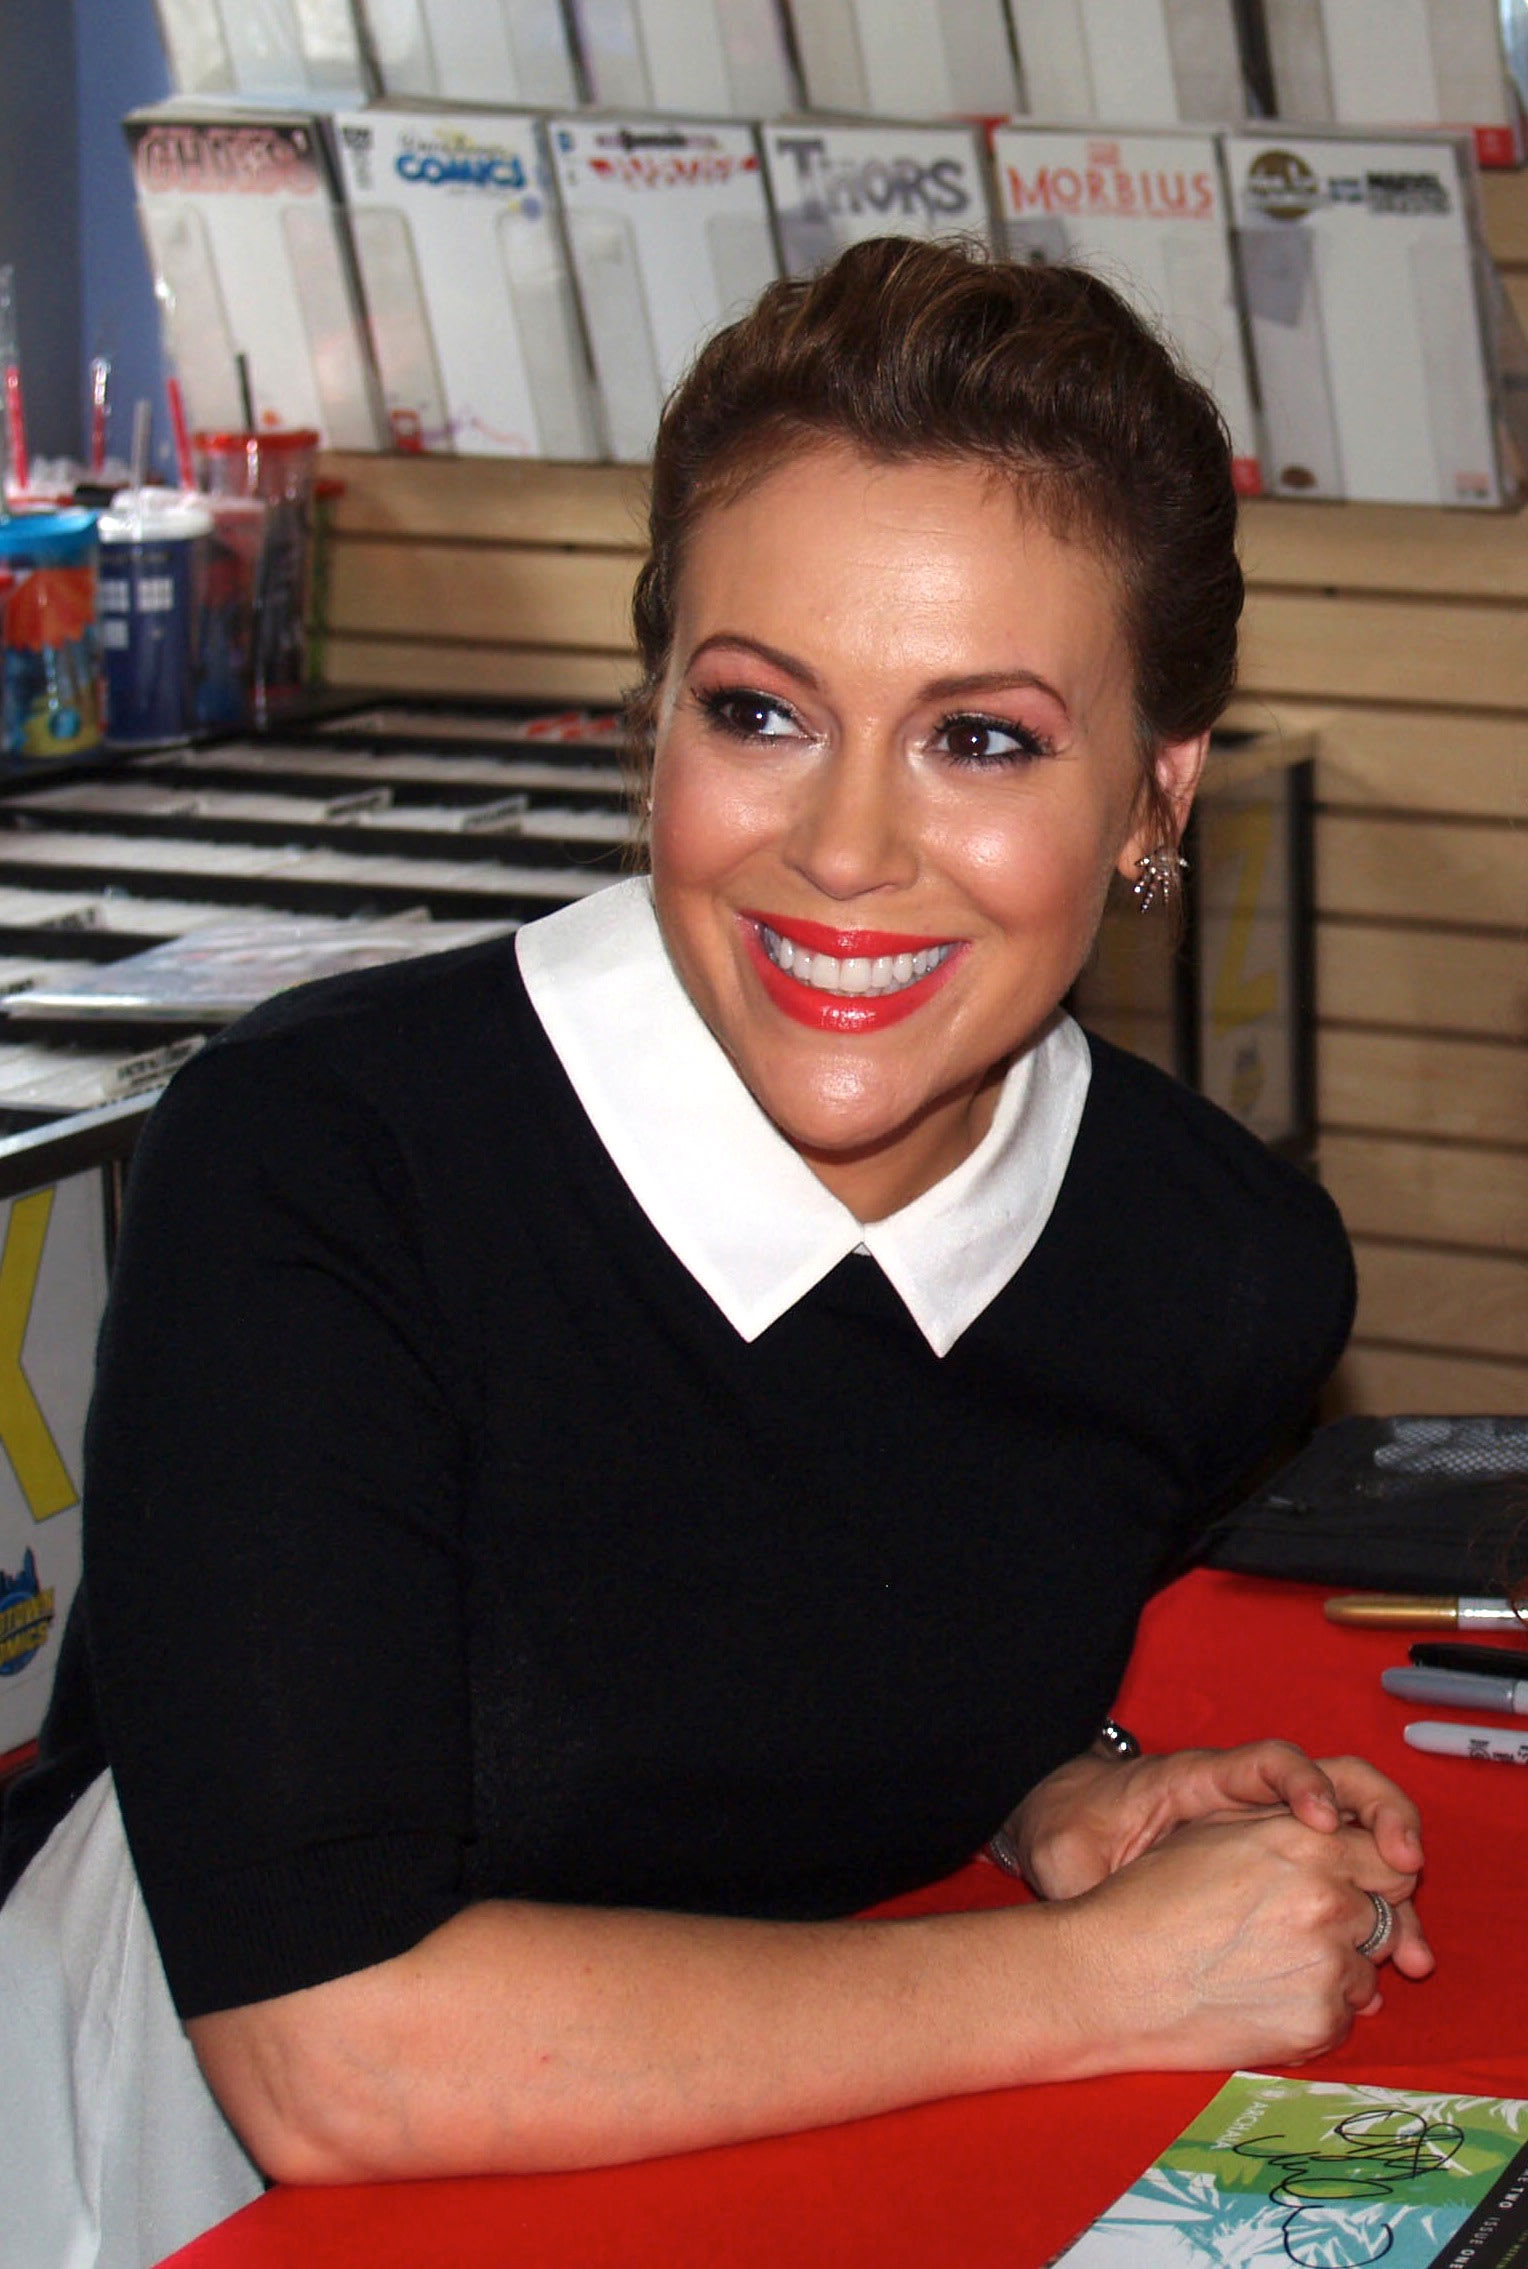 Photo of Alyssa Milano: American actress, singer, producer